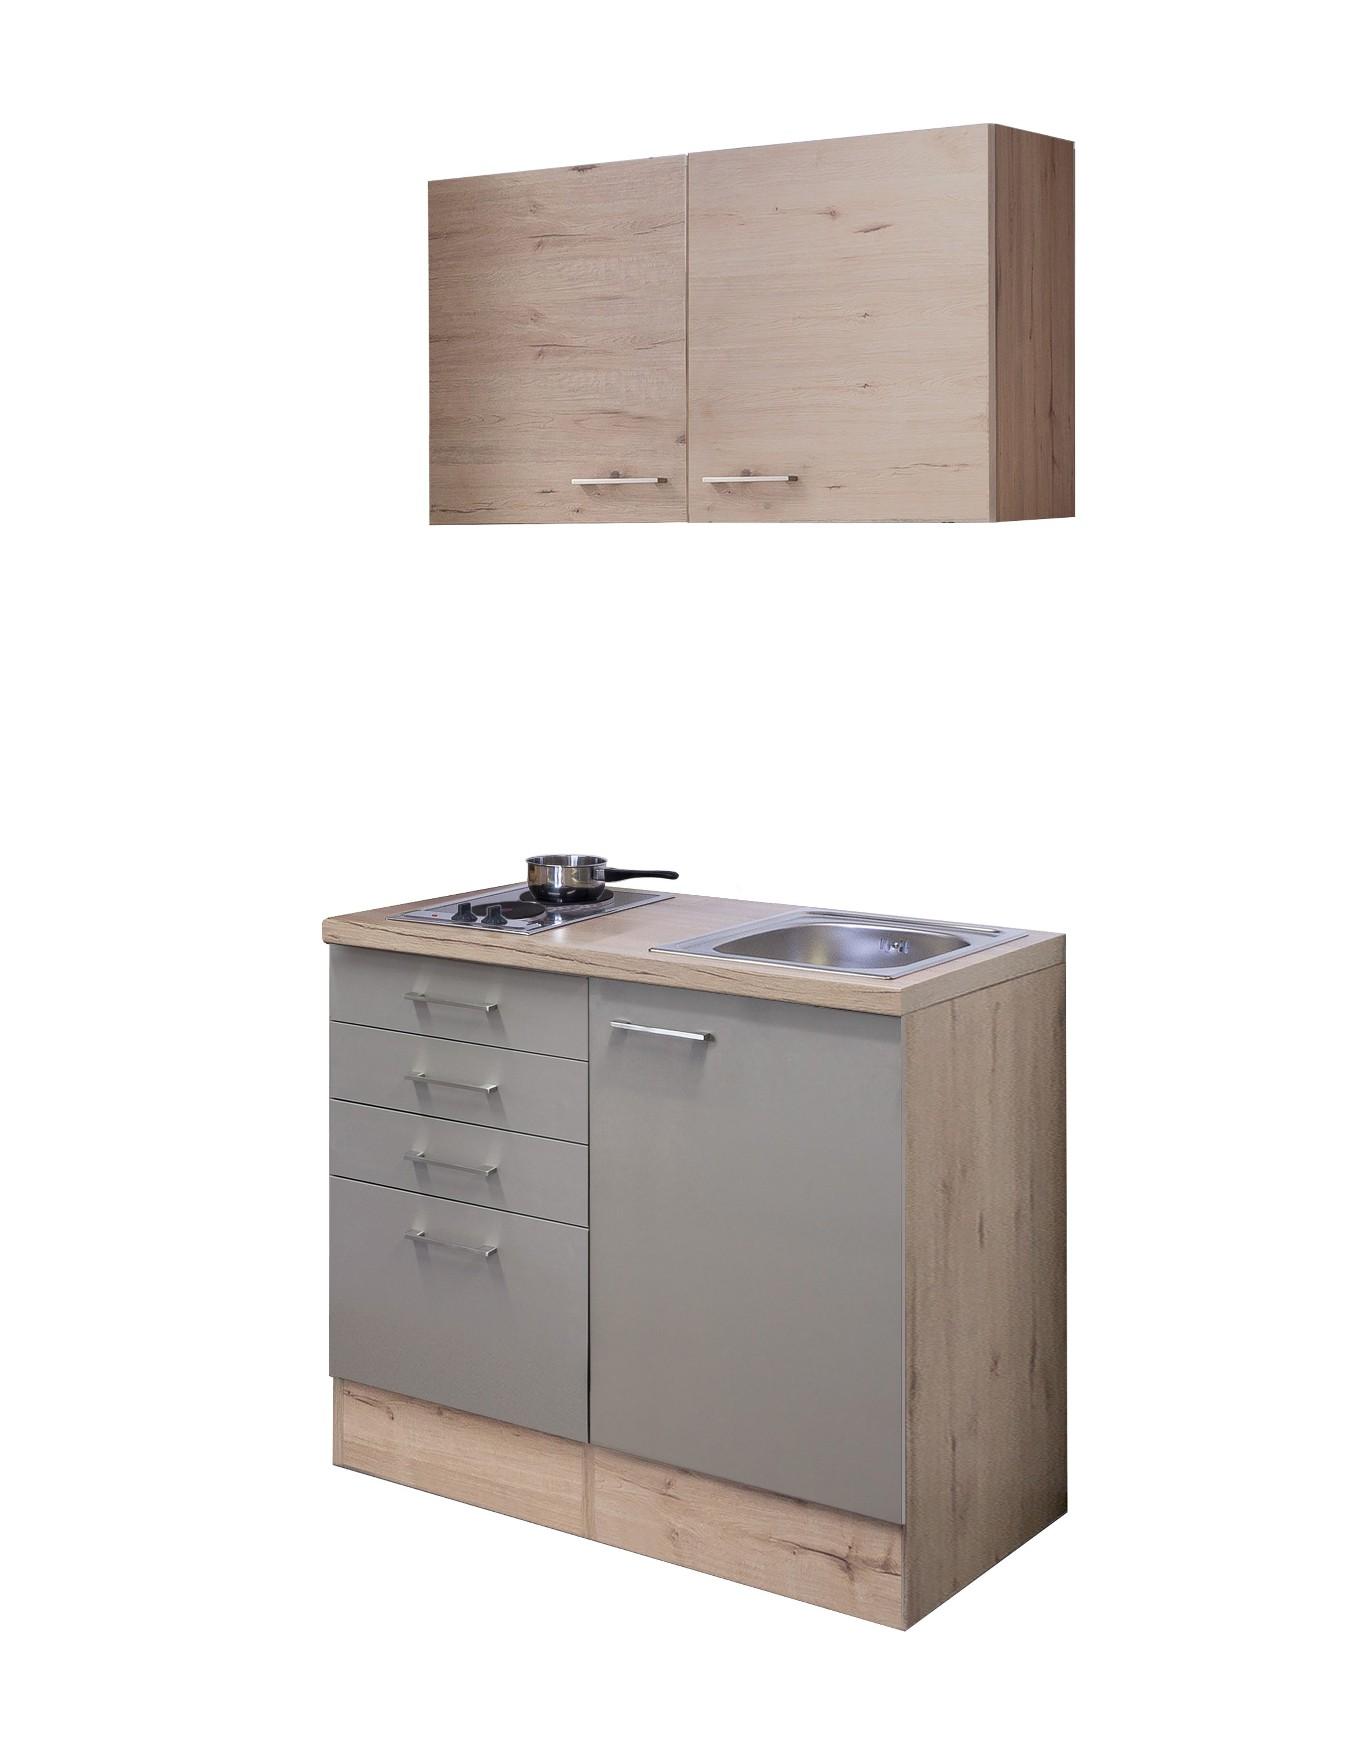 Top Singleküche RIVA - Breite 100 cm - Bronze Metallic Küche Singleküchen PD26